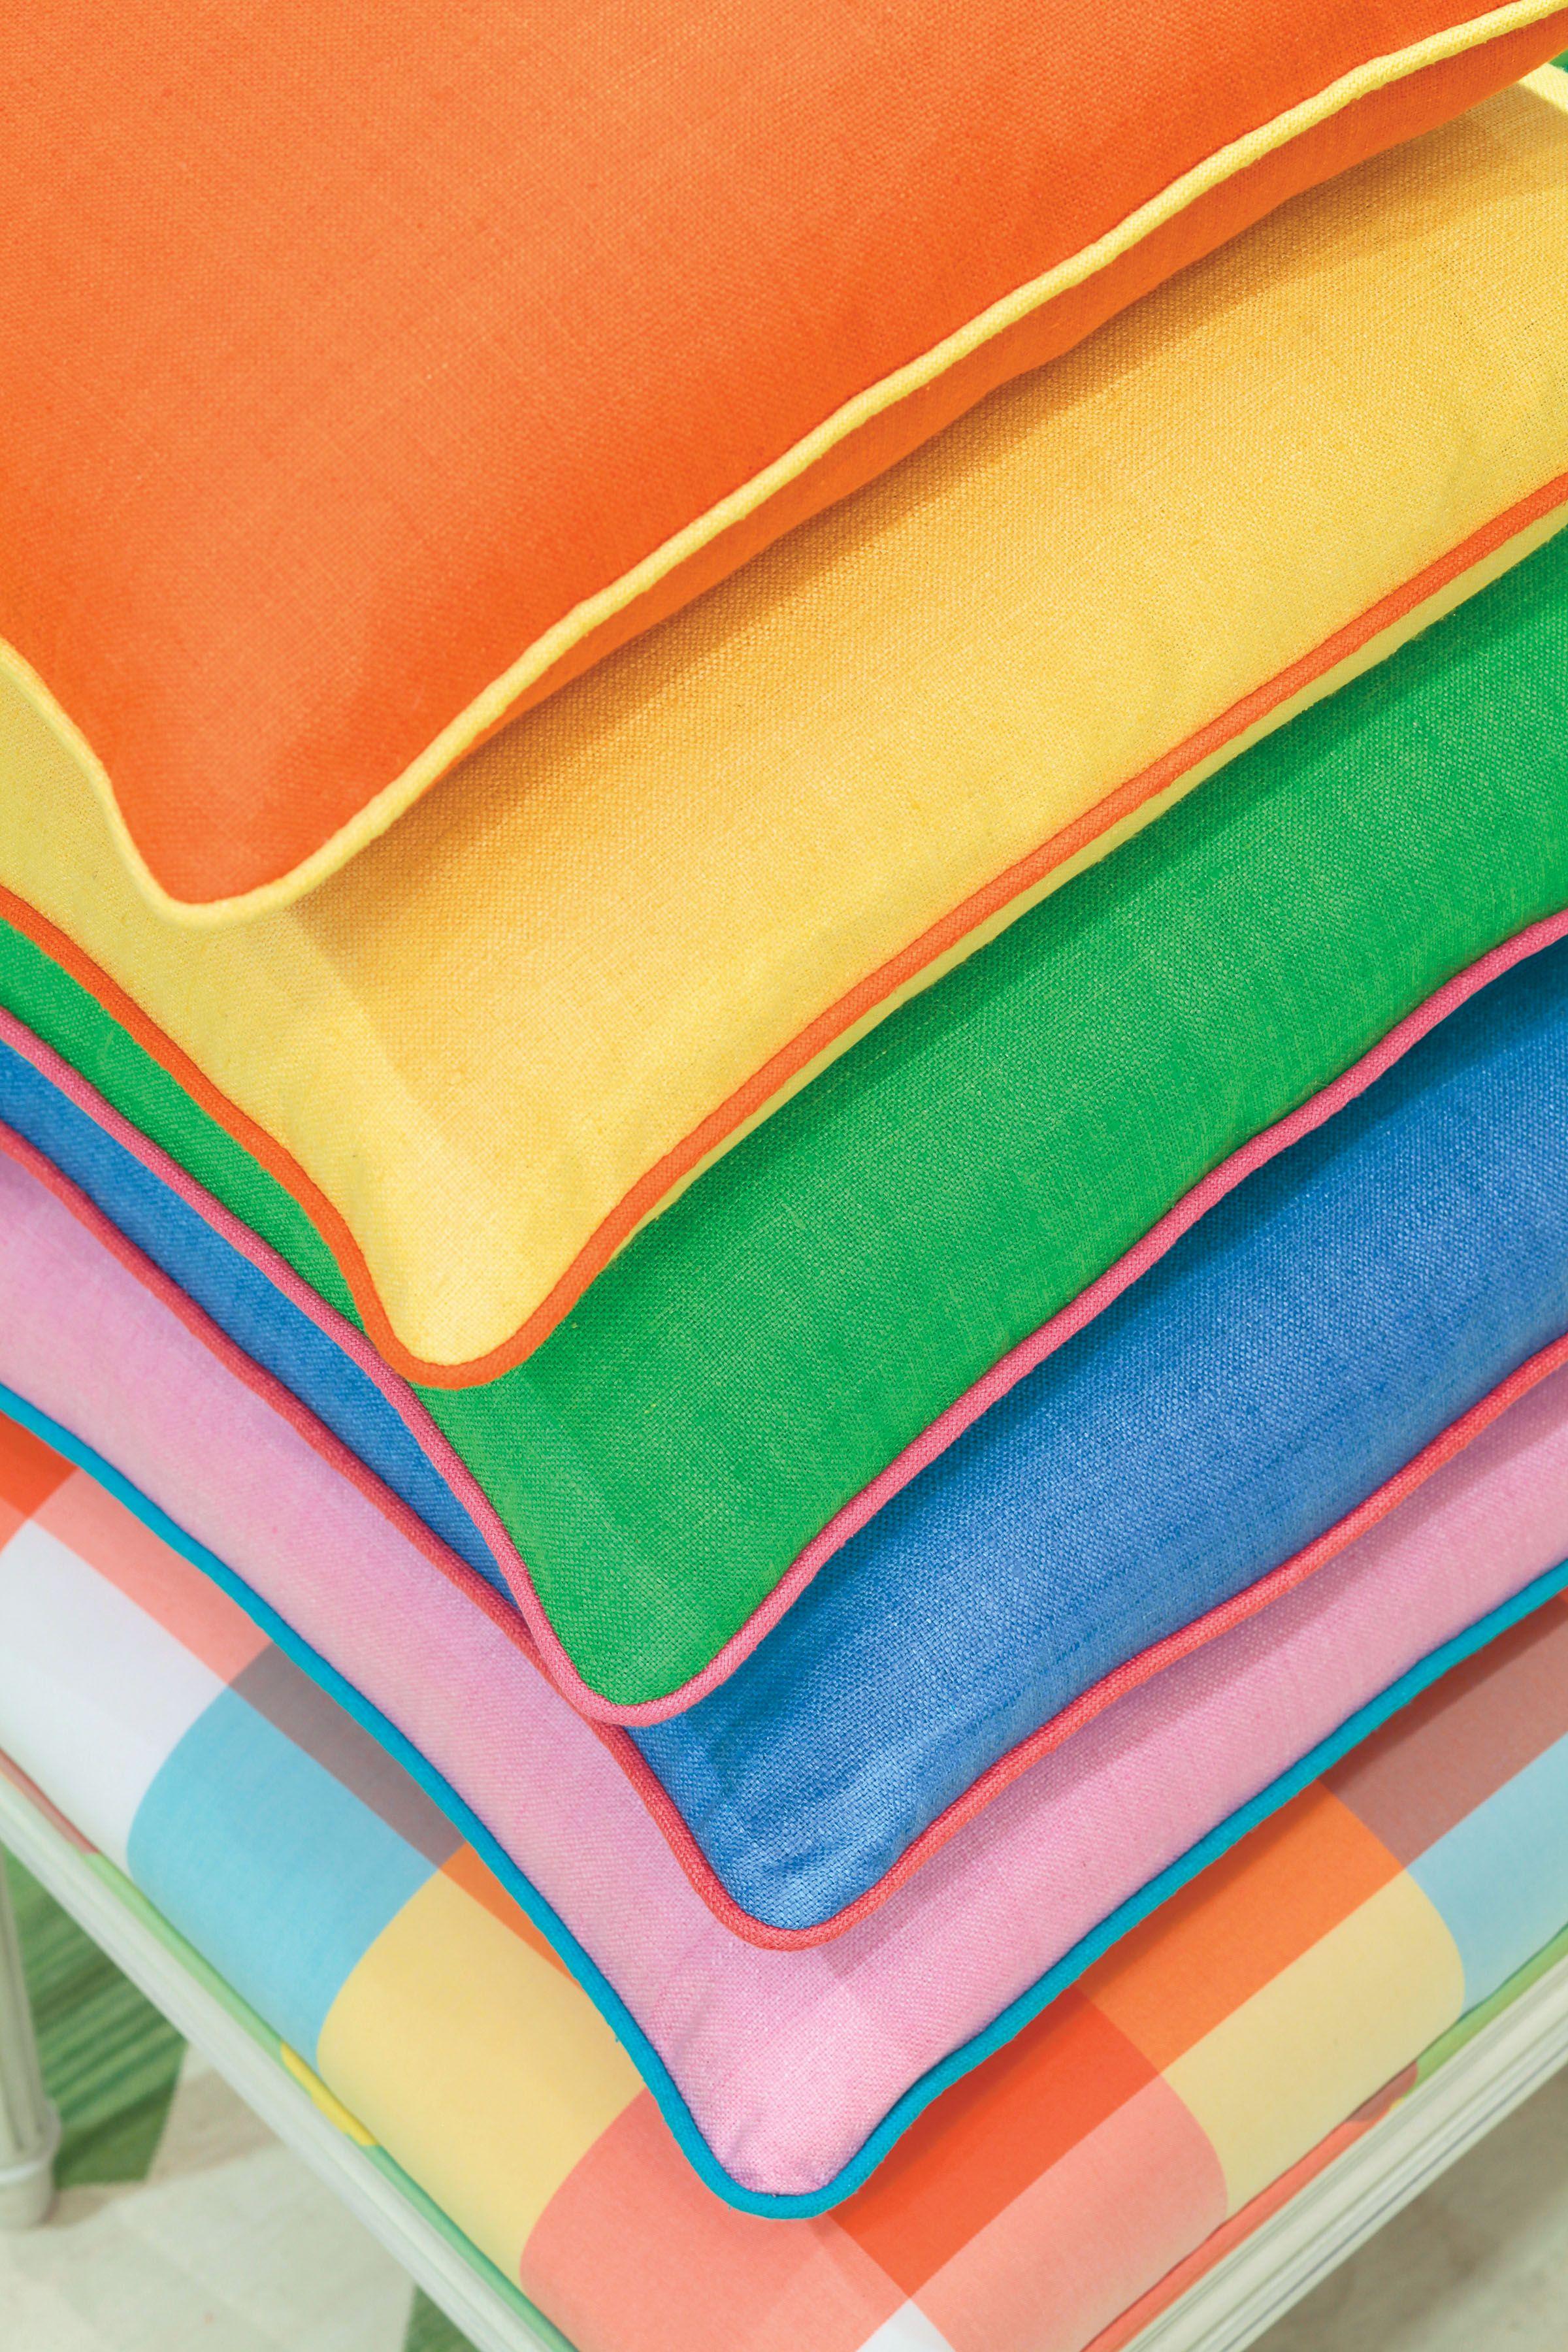 Lilly Pulitzer For Lee Jofa Kravet Fabrics Fabric Decor Home